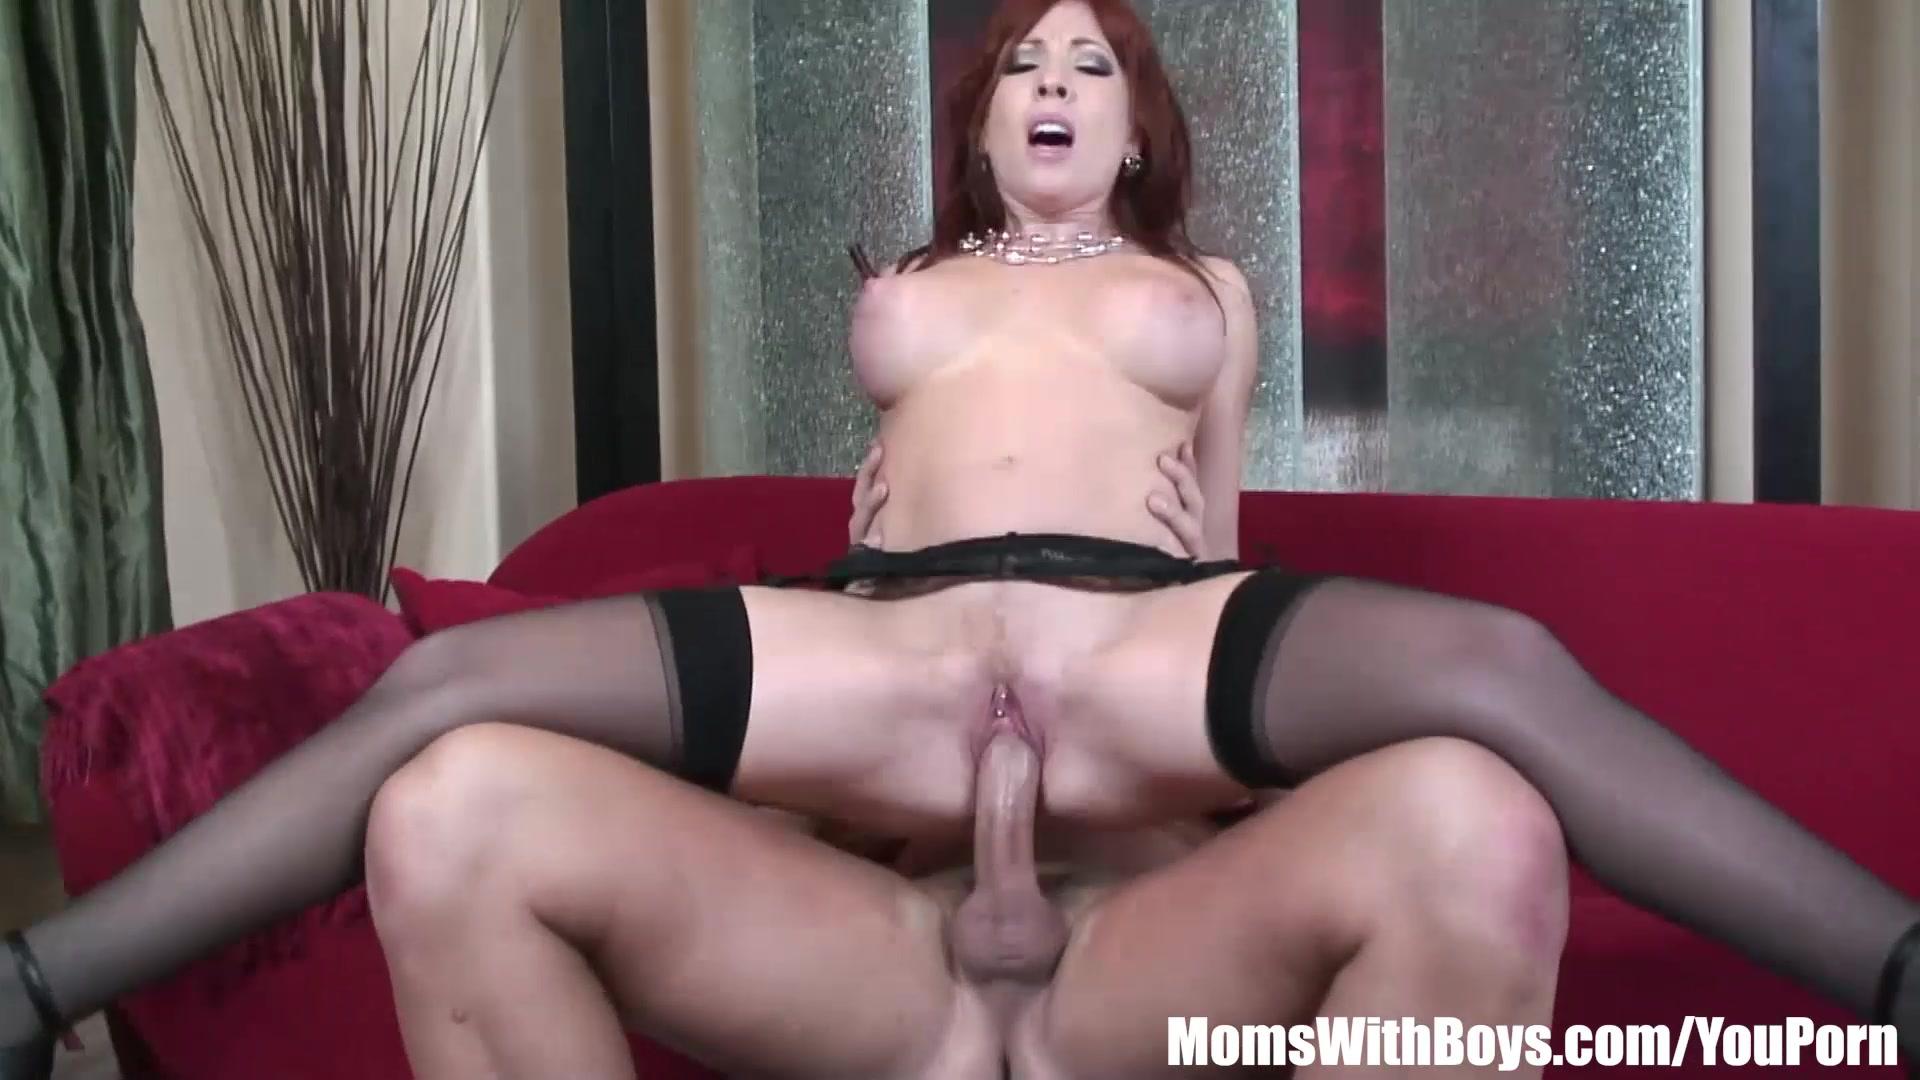 August pornstars anal scene